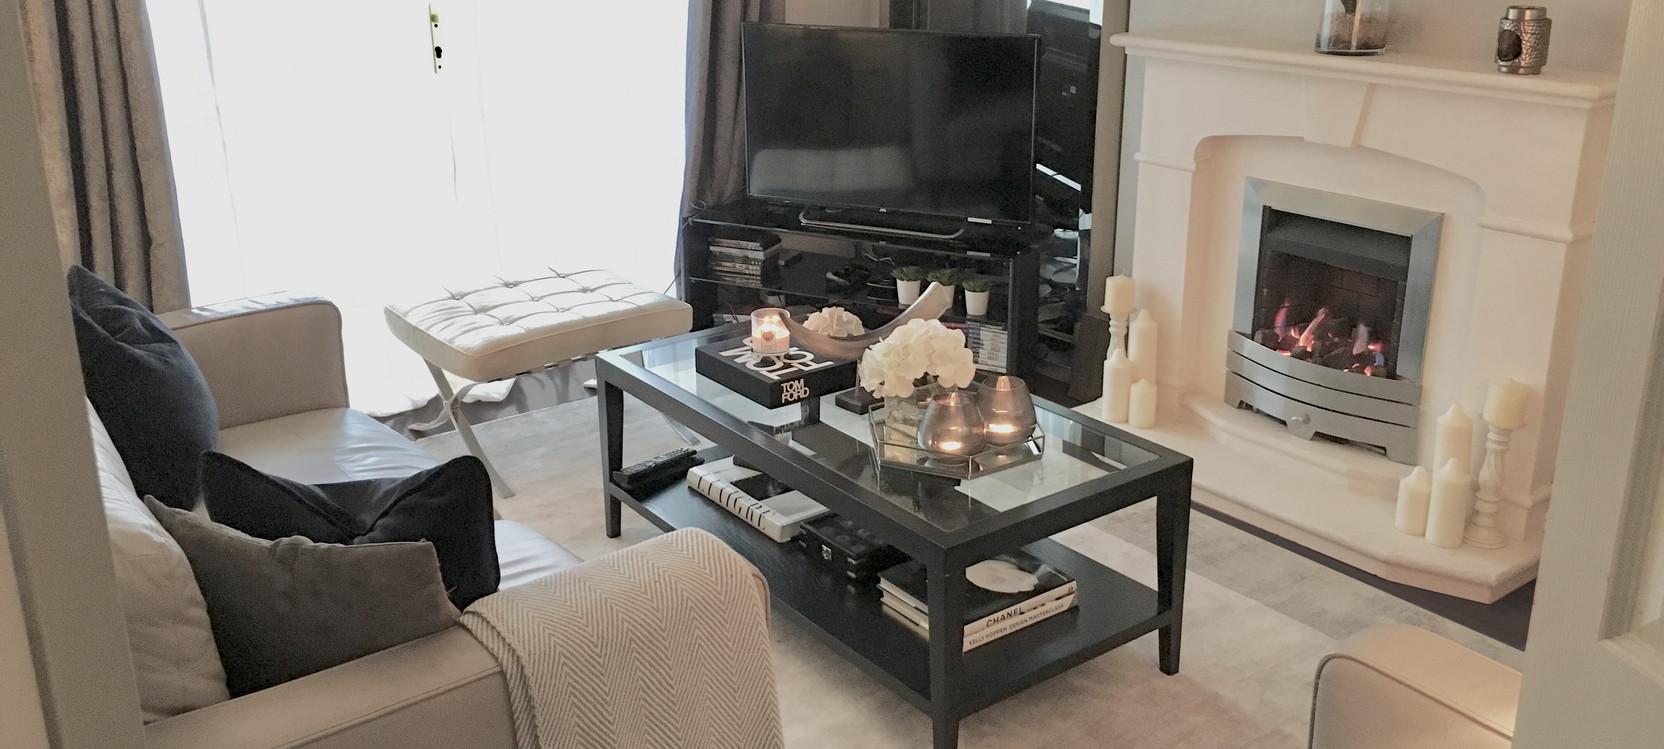 Lounge worsley interior designer.jpg